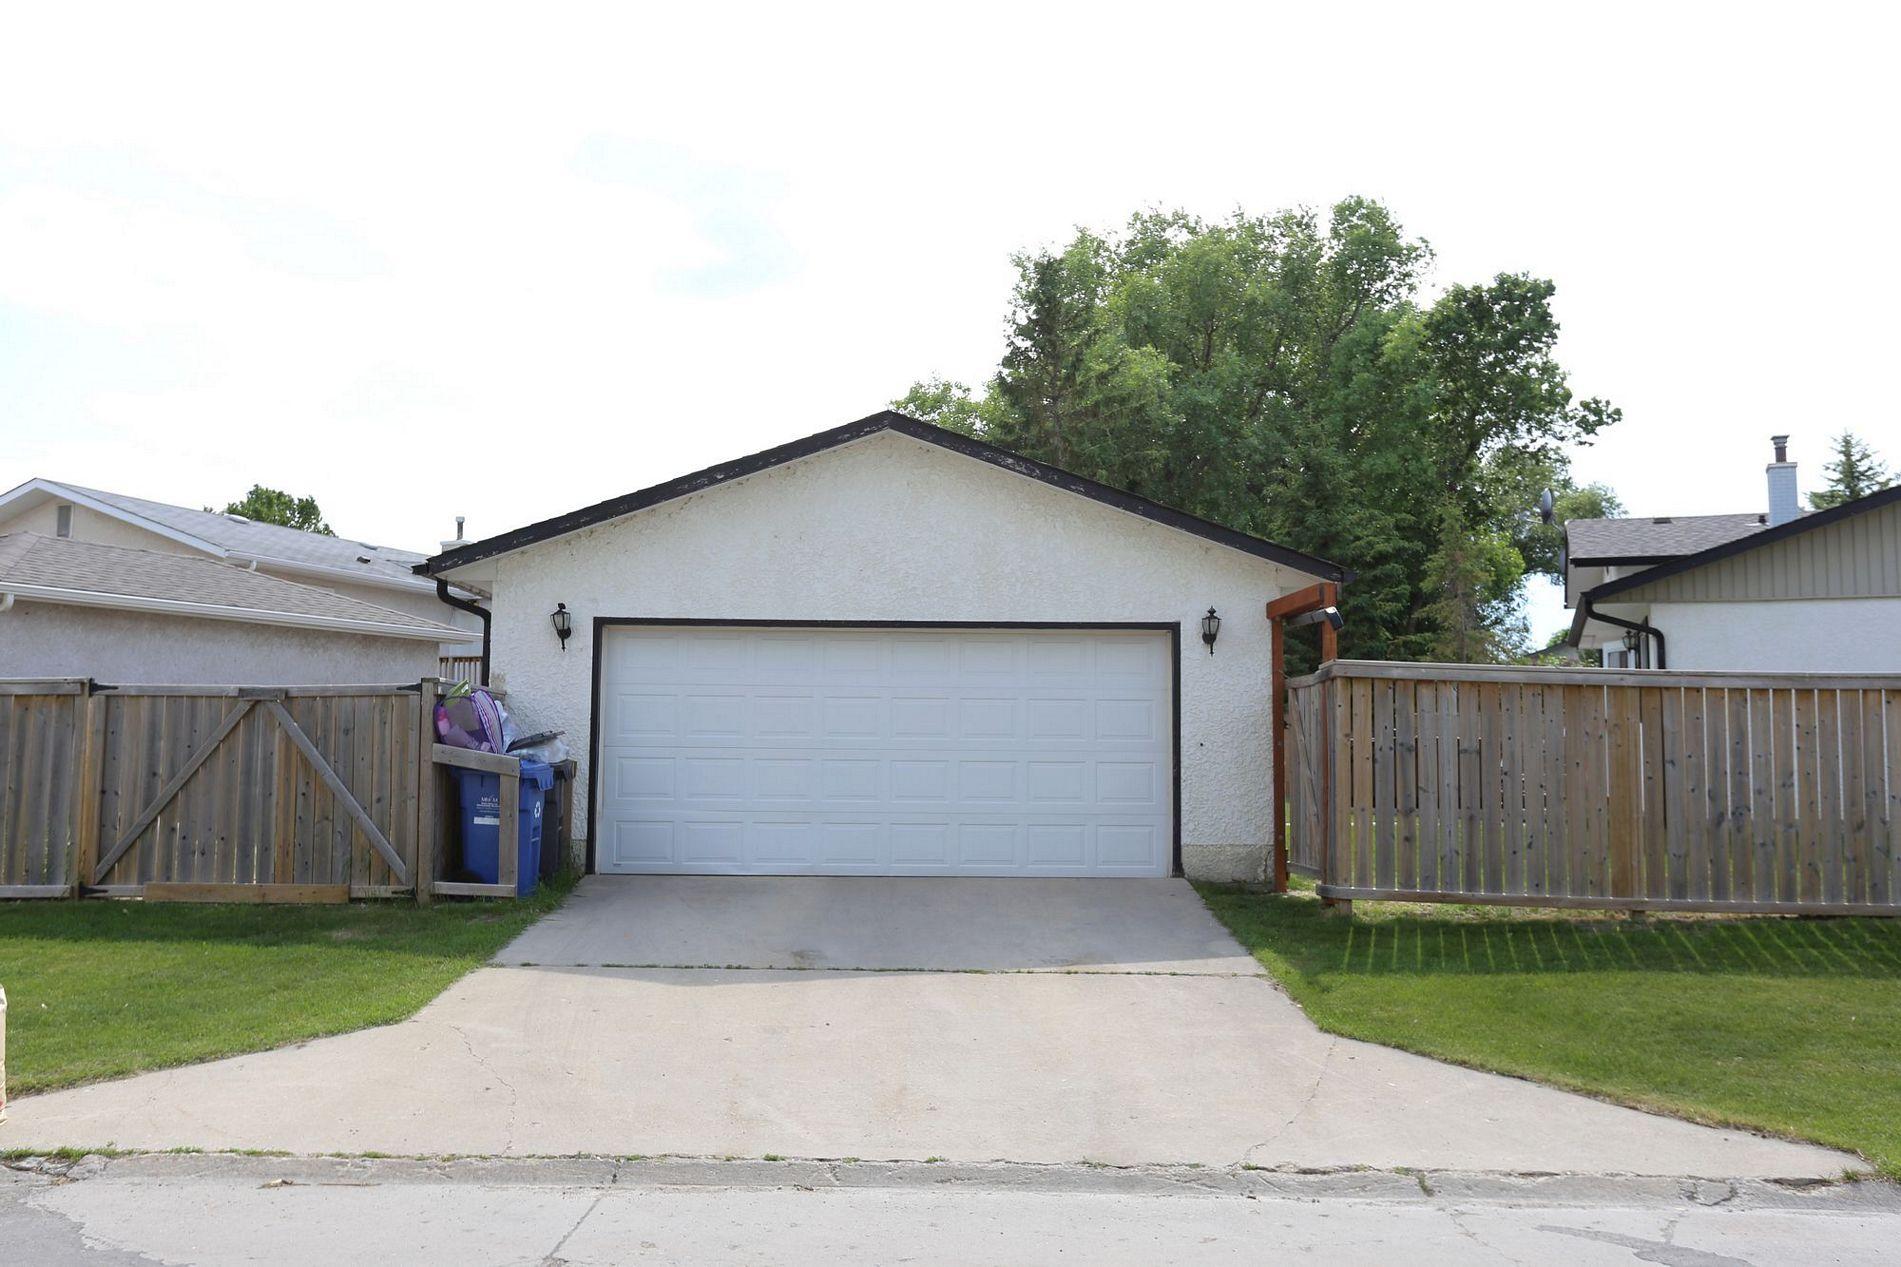 26 Lakeside Drive, Winnipeg, Manitoba  R3T 4J1 - Photo 25 - 1714697